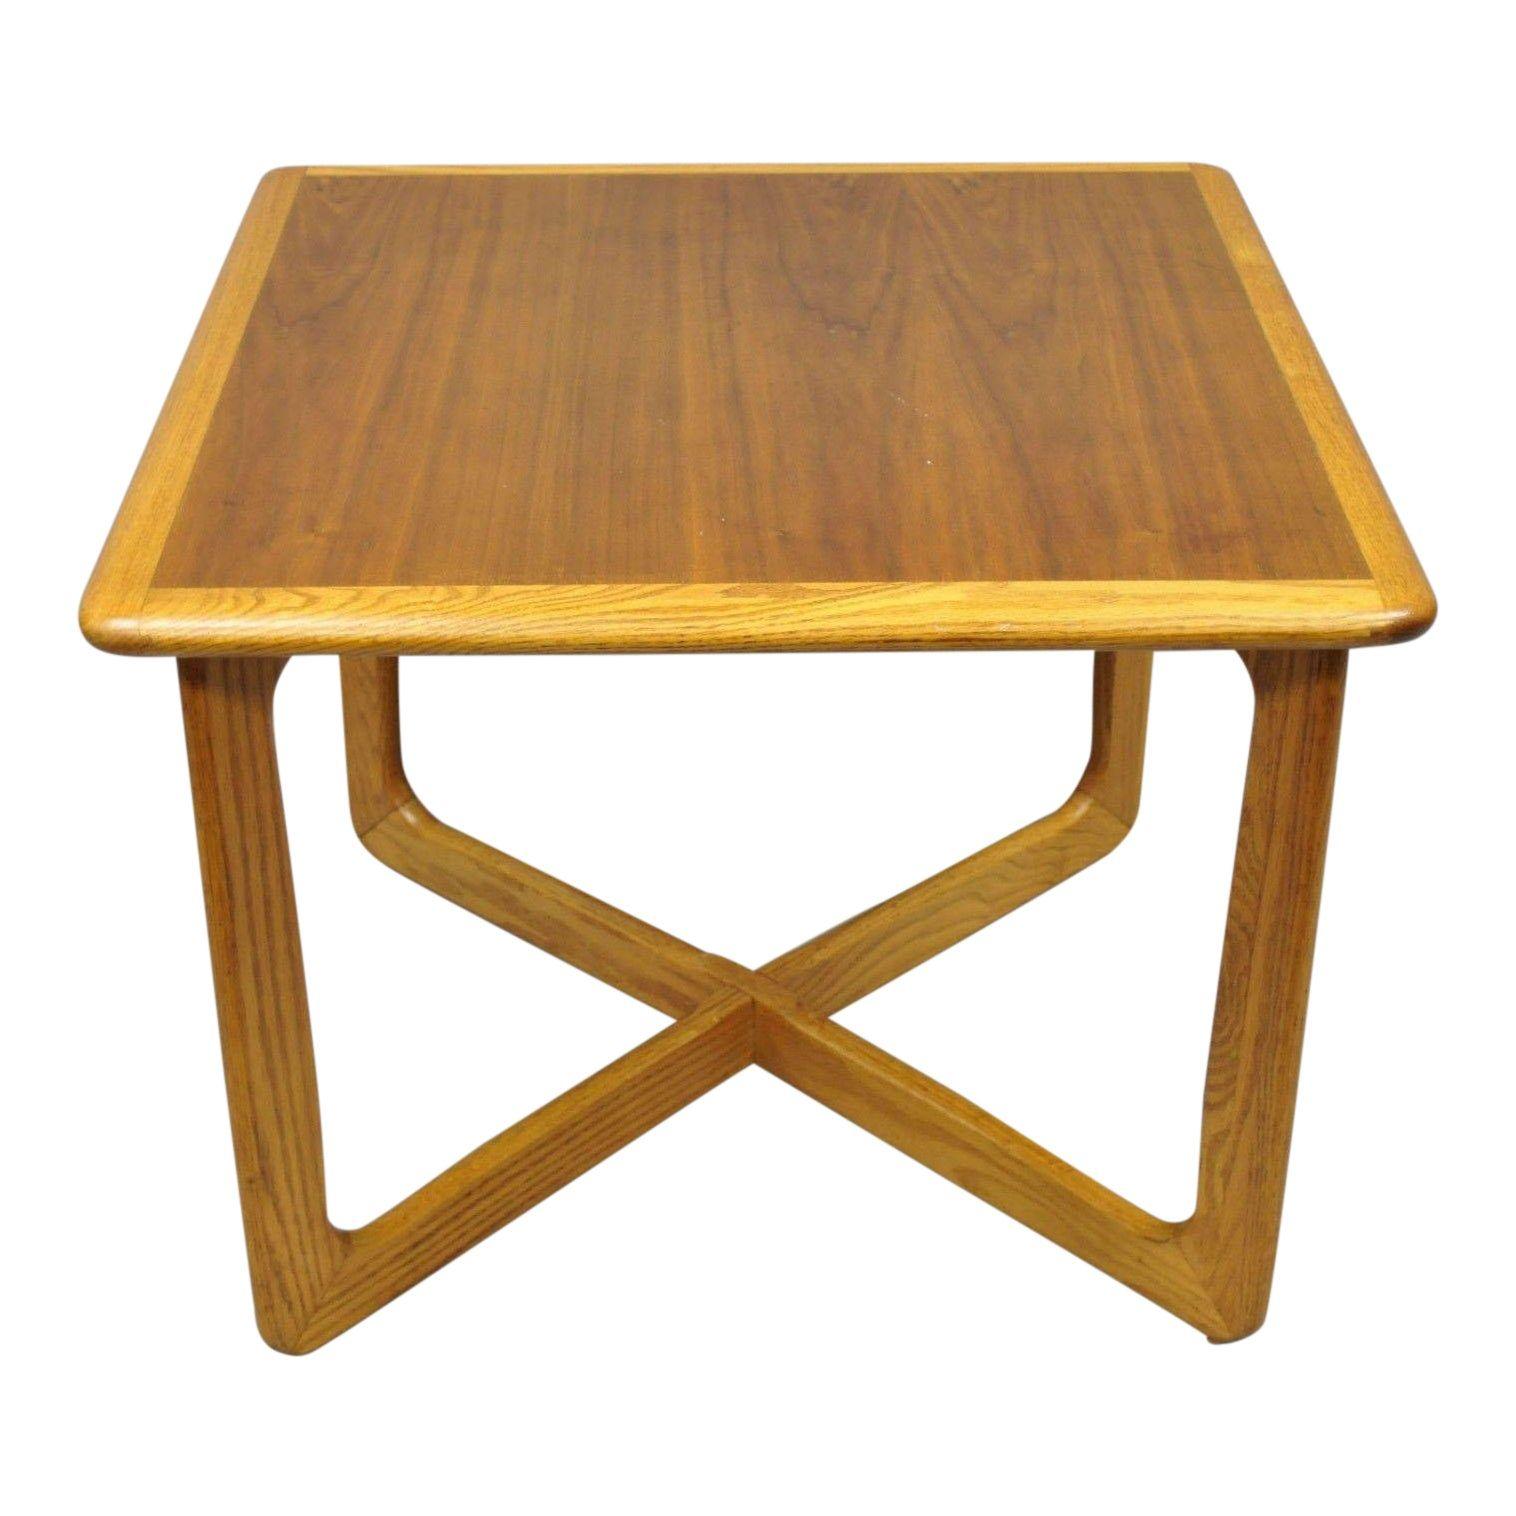 Altavista Lane Mid Century Modern Walnut Square Side Coffee Table Modern Square Coffee Table Side Coffee Table Mid Century Modern Side Table [ 1516 x 1516 Pixel ]